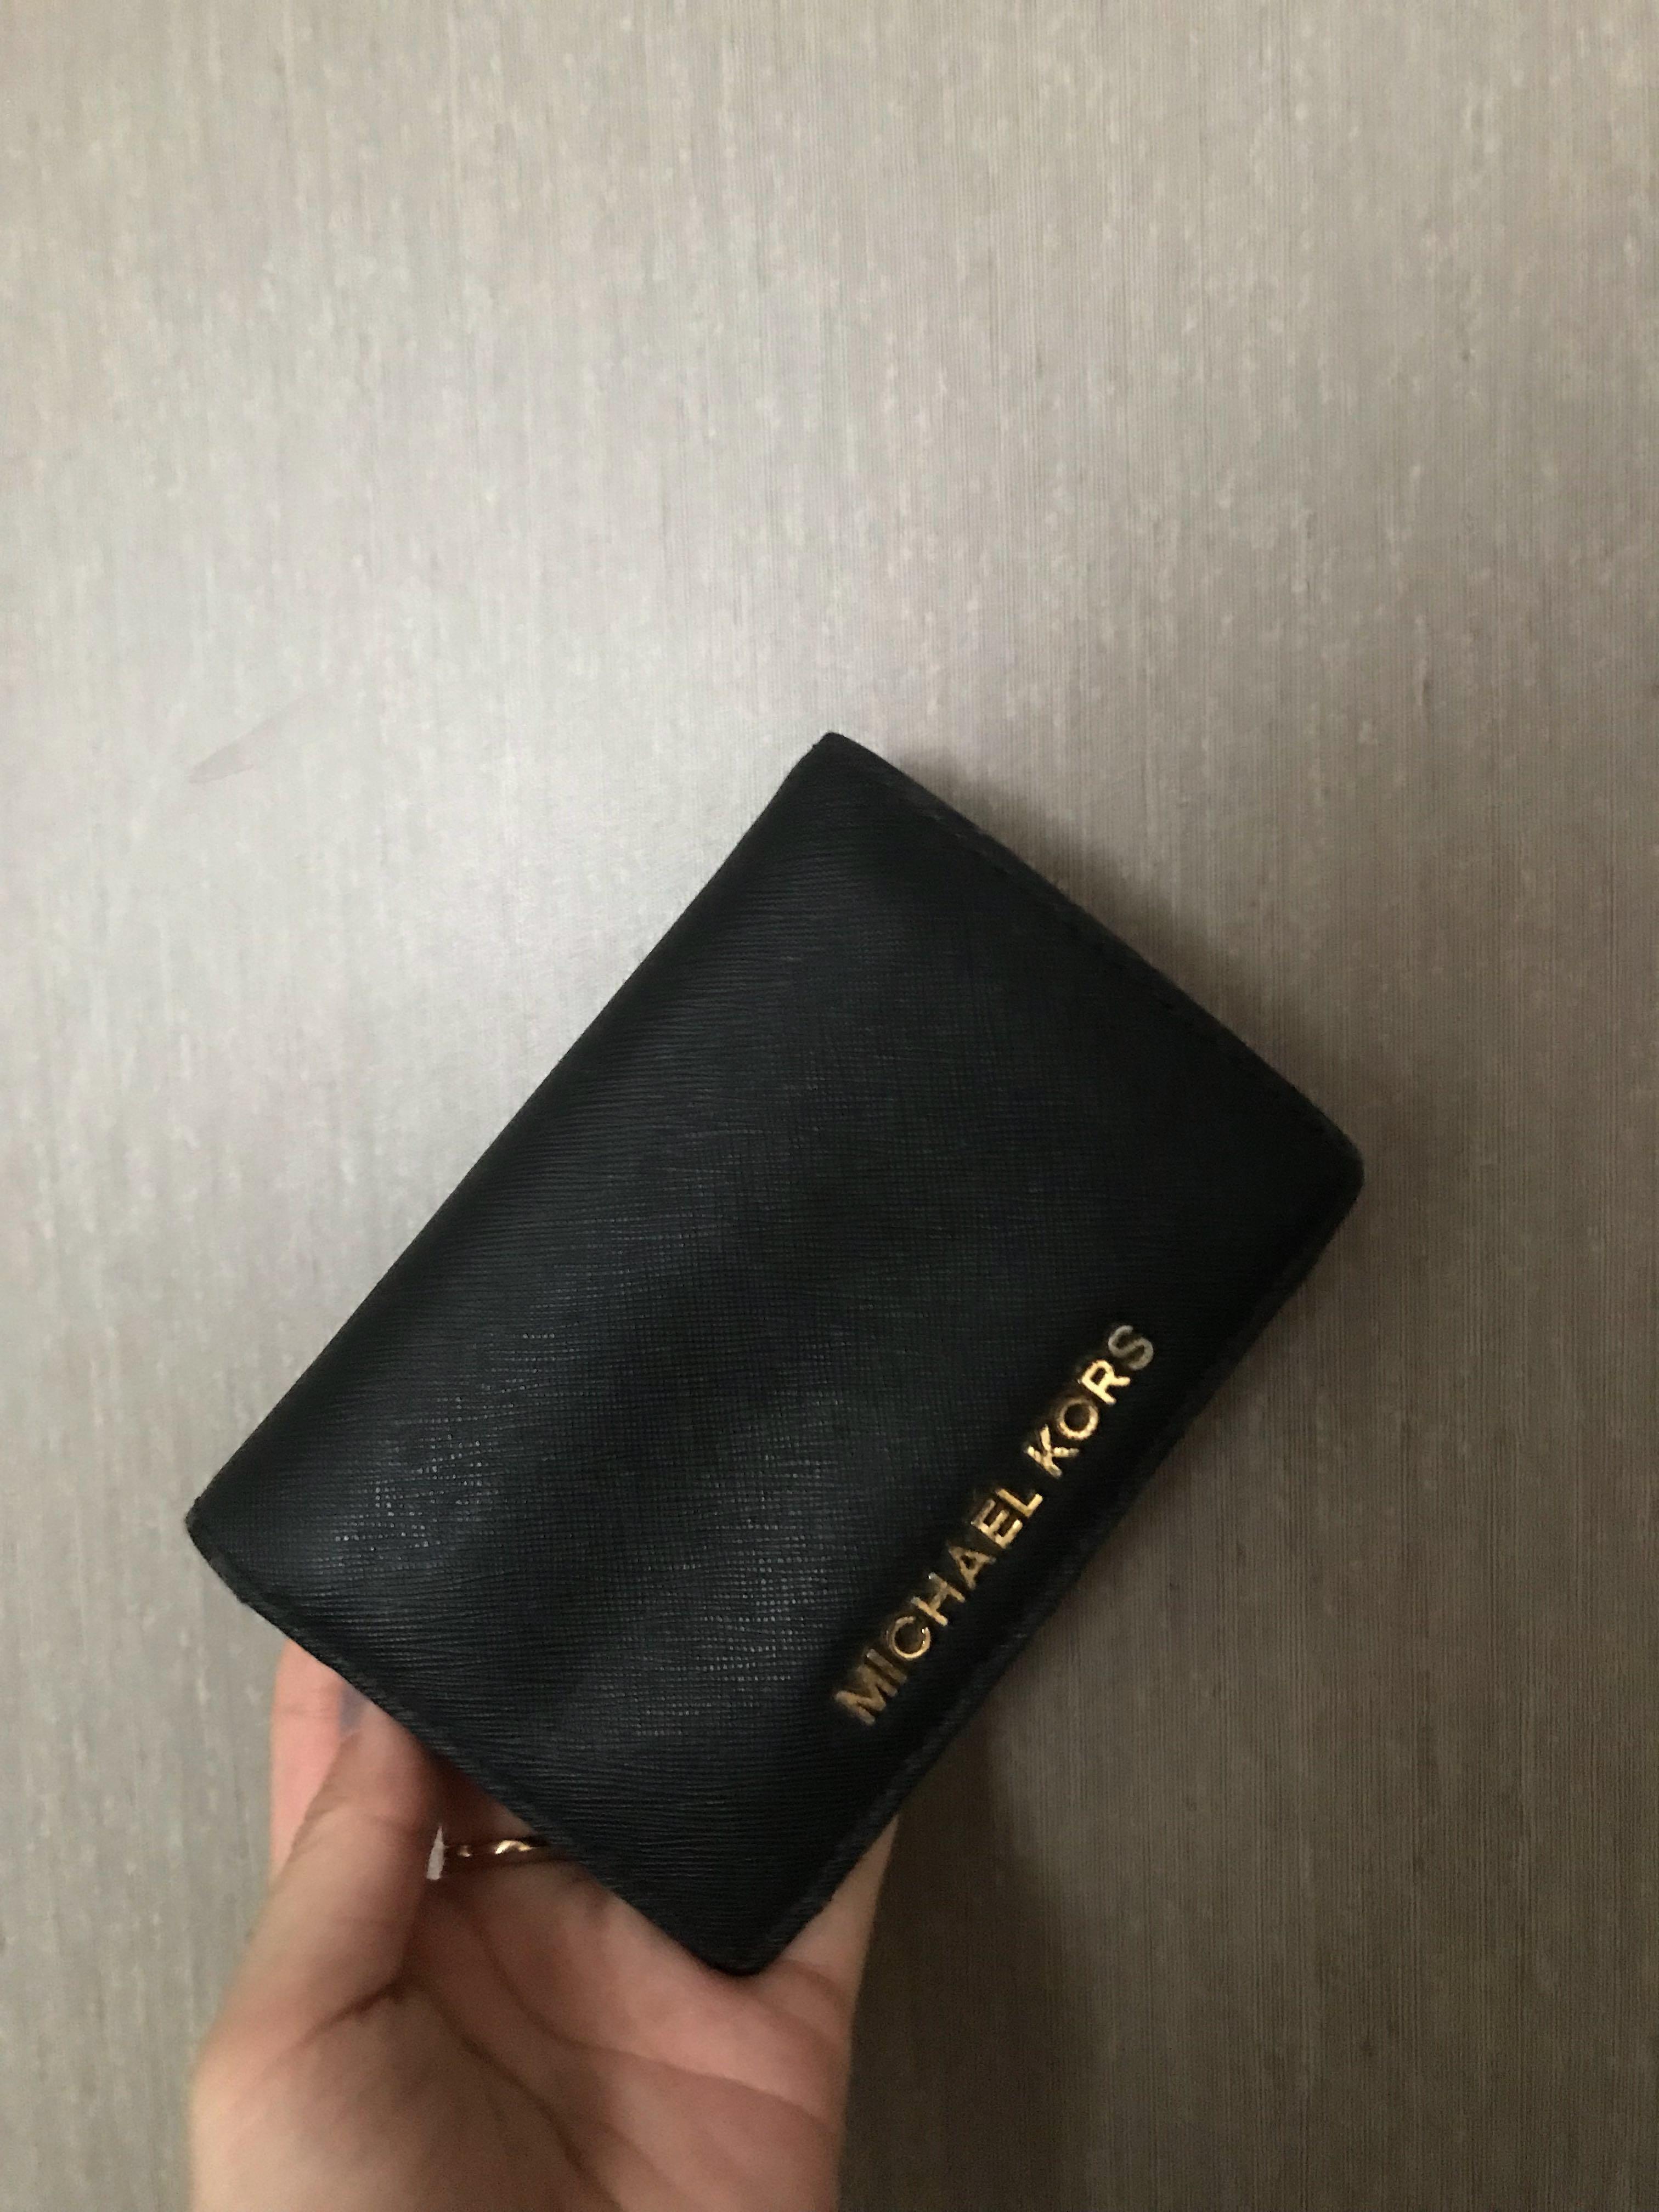 5981aa159059 preloved michael kors black small wallet, Luxury, Bags & Wallets, Wallets  on Carousell